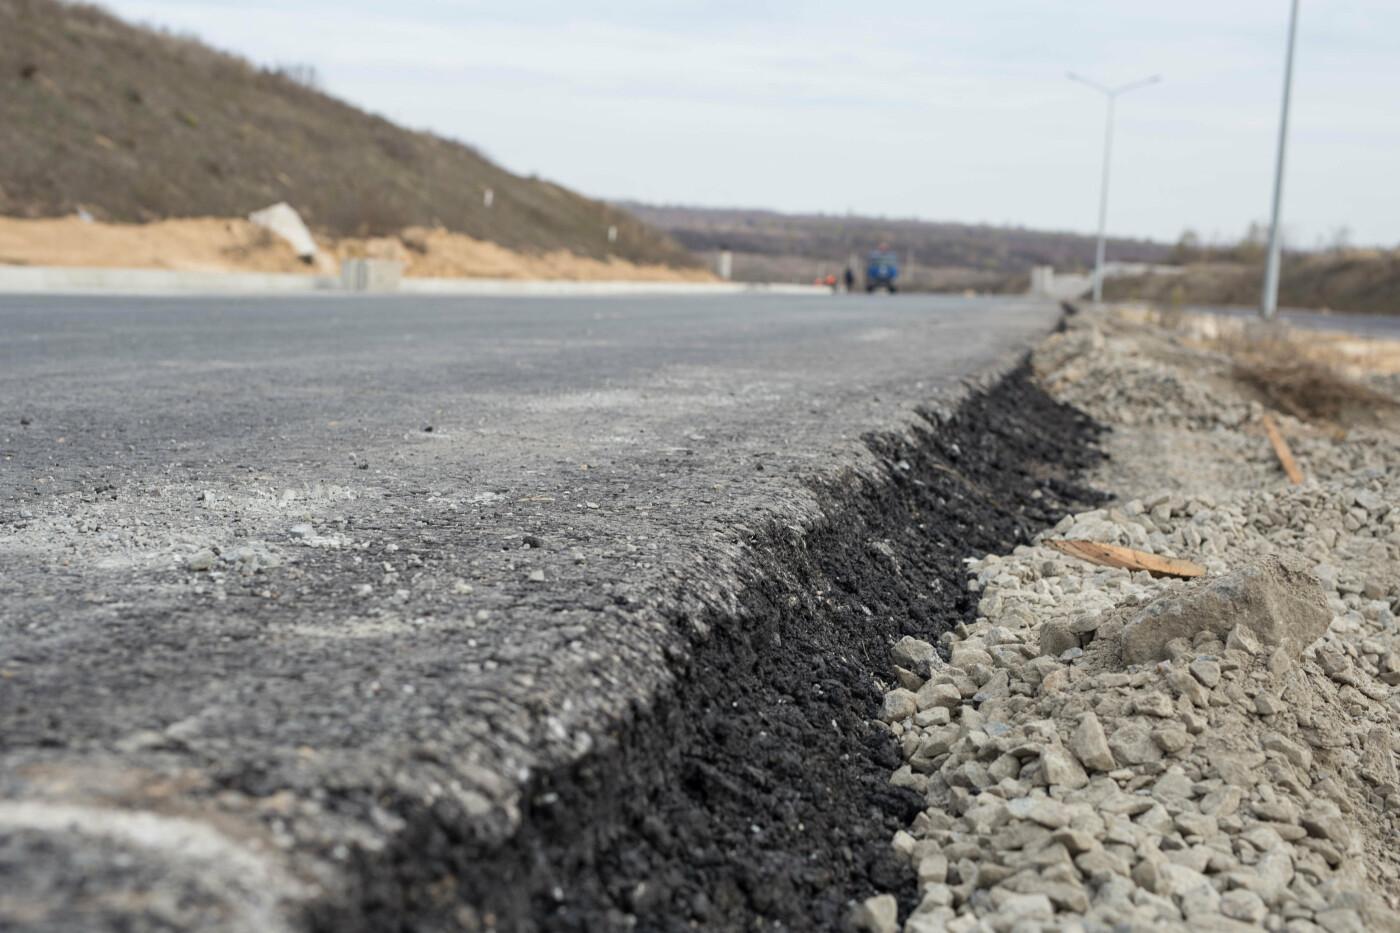 Под Днепром строят еще одну объездную дорогу, - ФОТО, фото-4